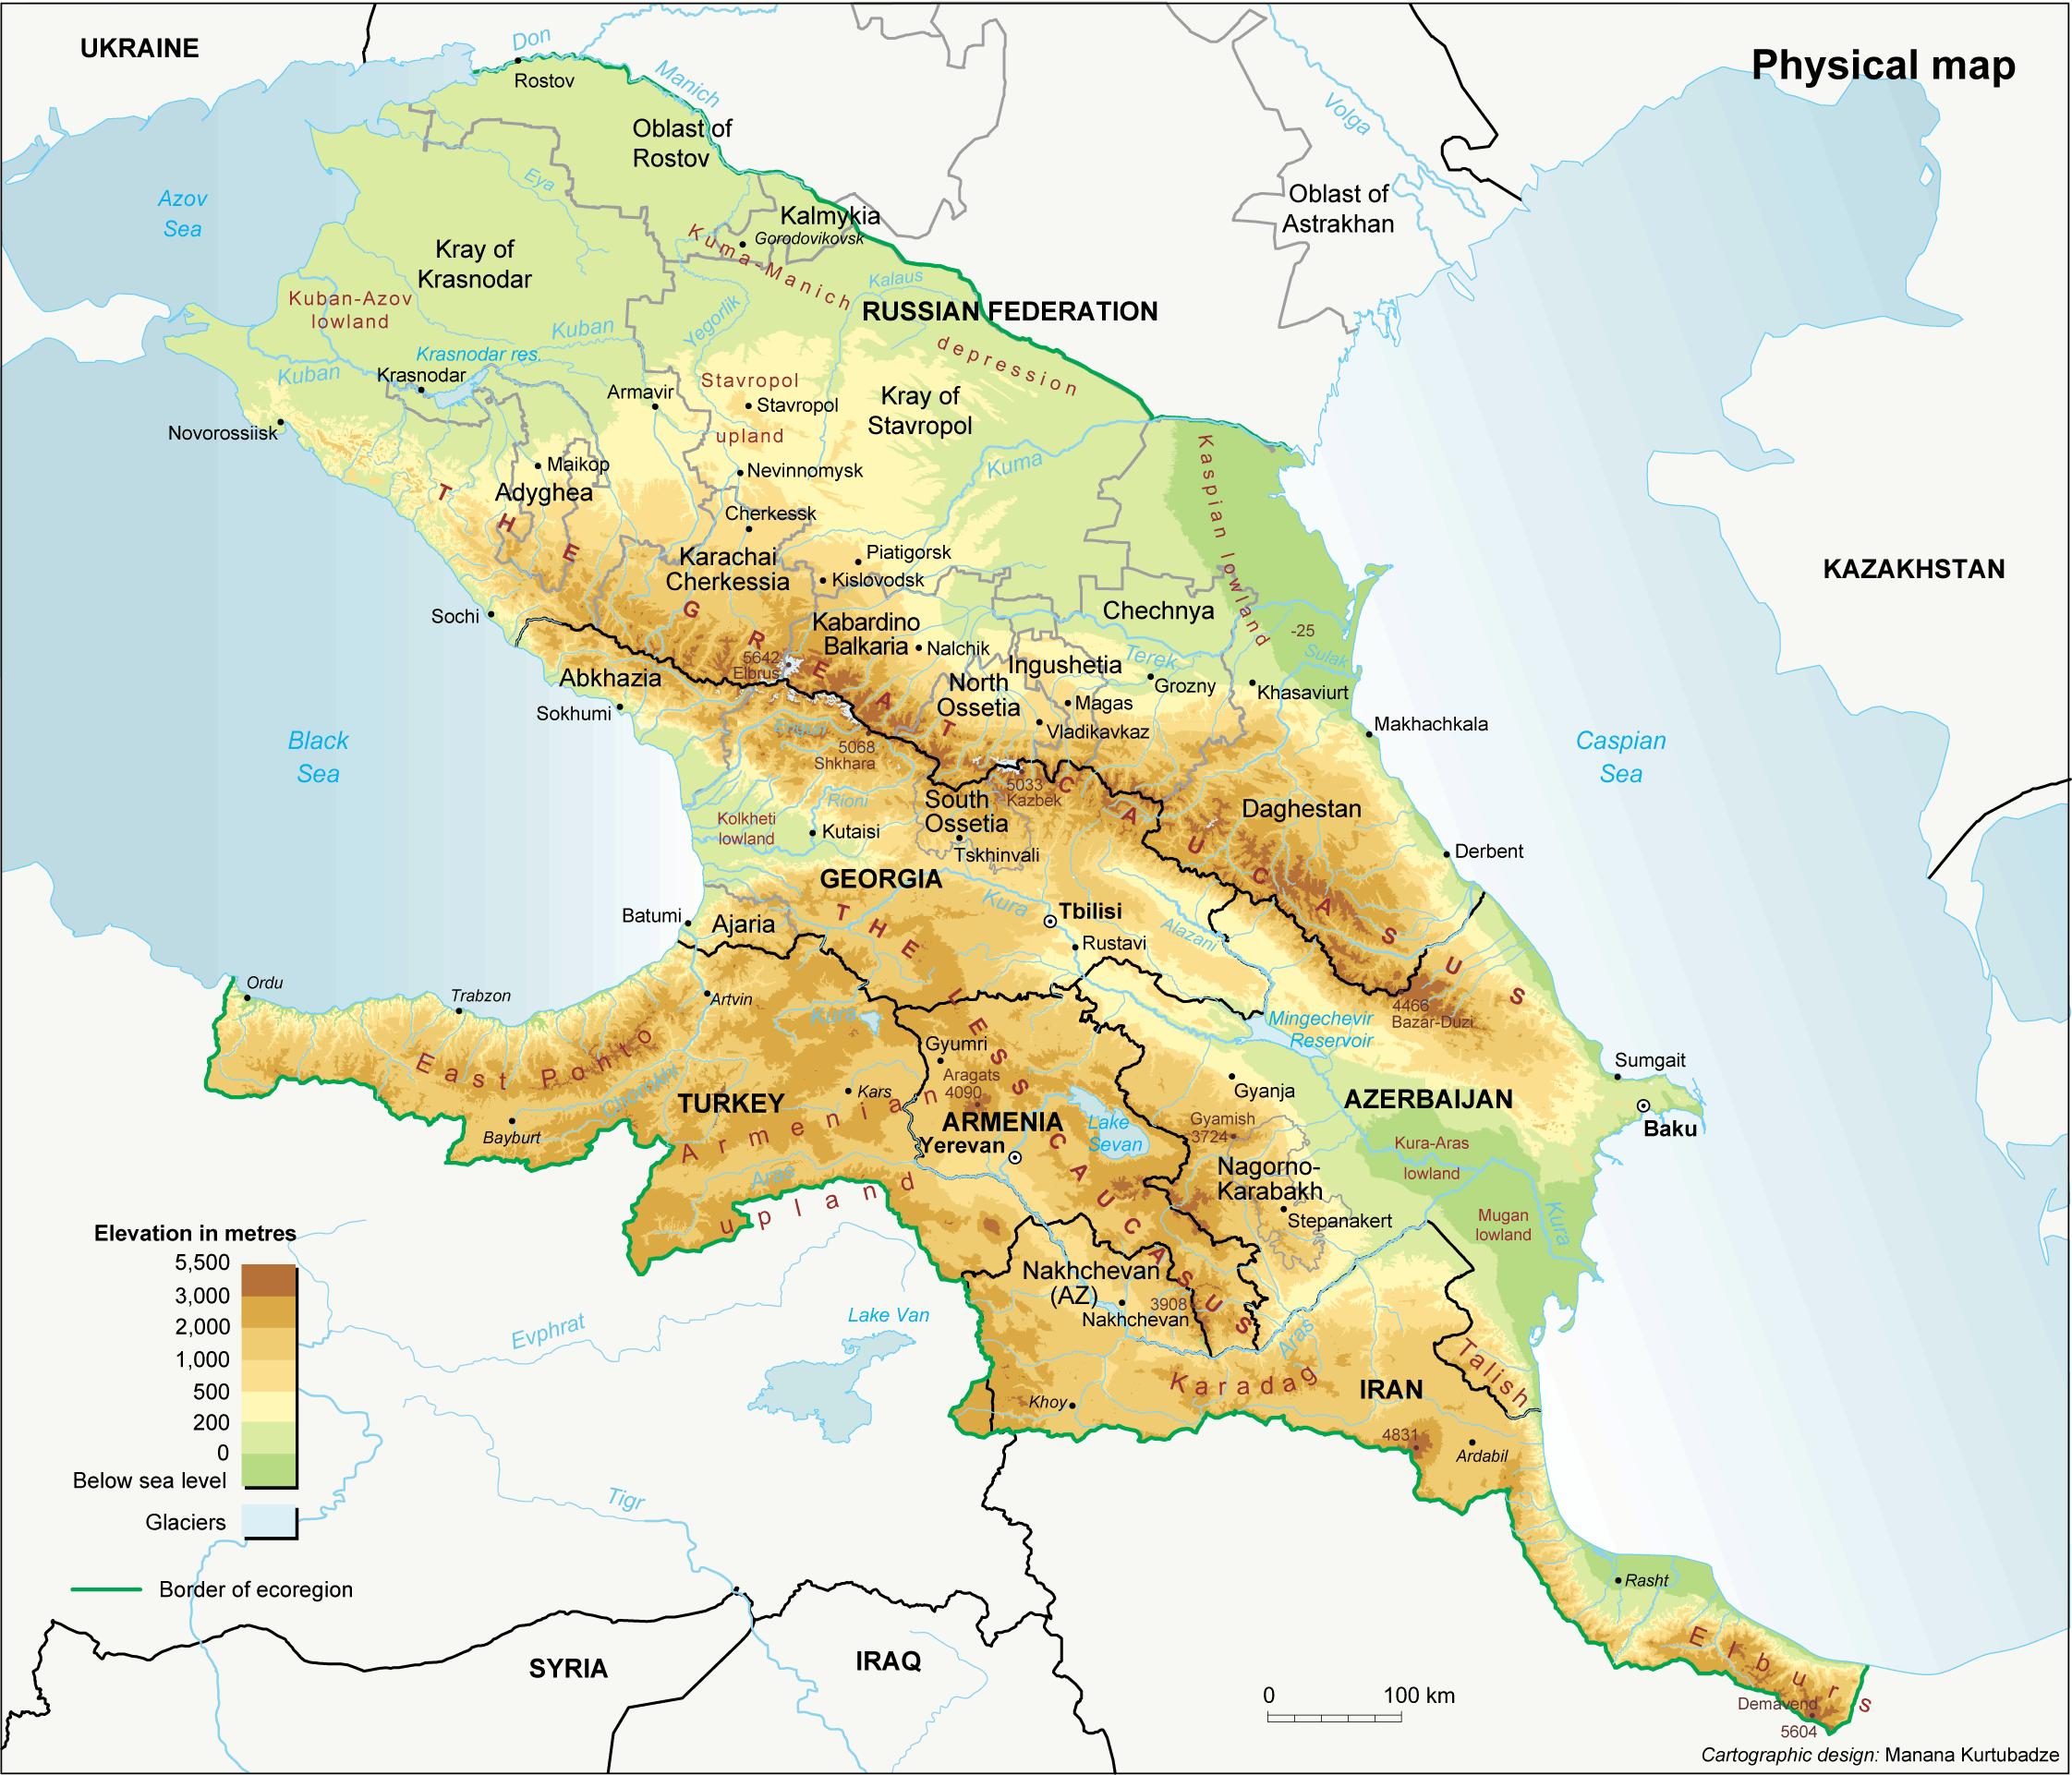 Credit: https://eurasiangeopolitics.files.wordpress.com/2014/08/russia-nc-north-caucasus-physical.png